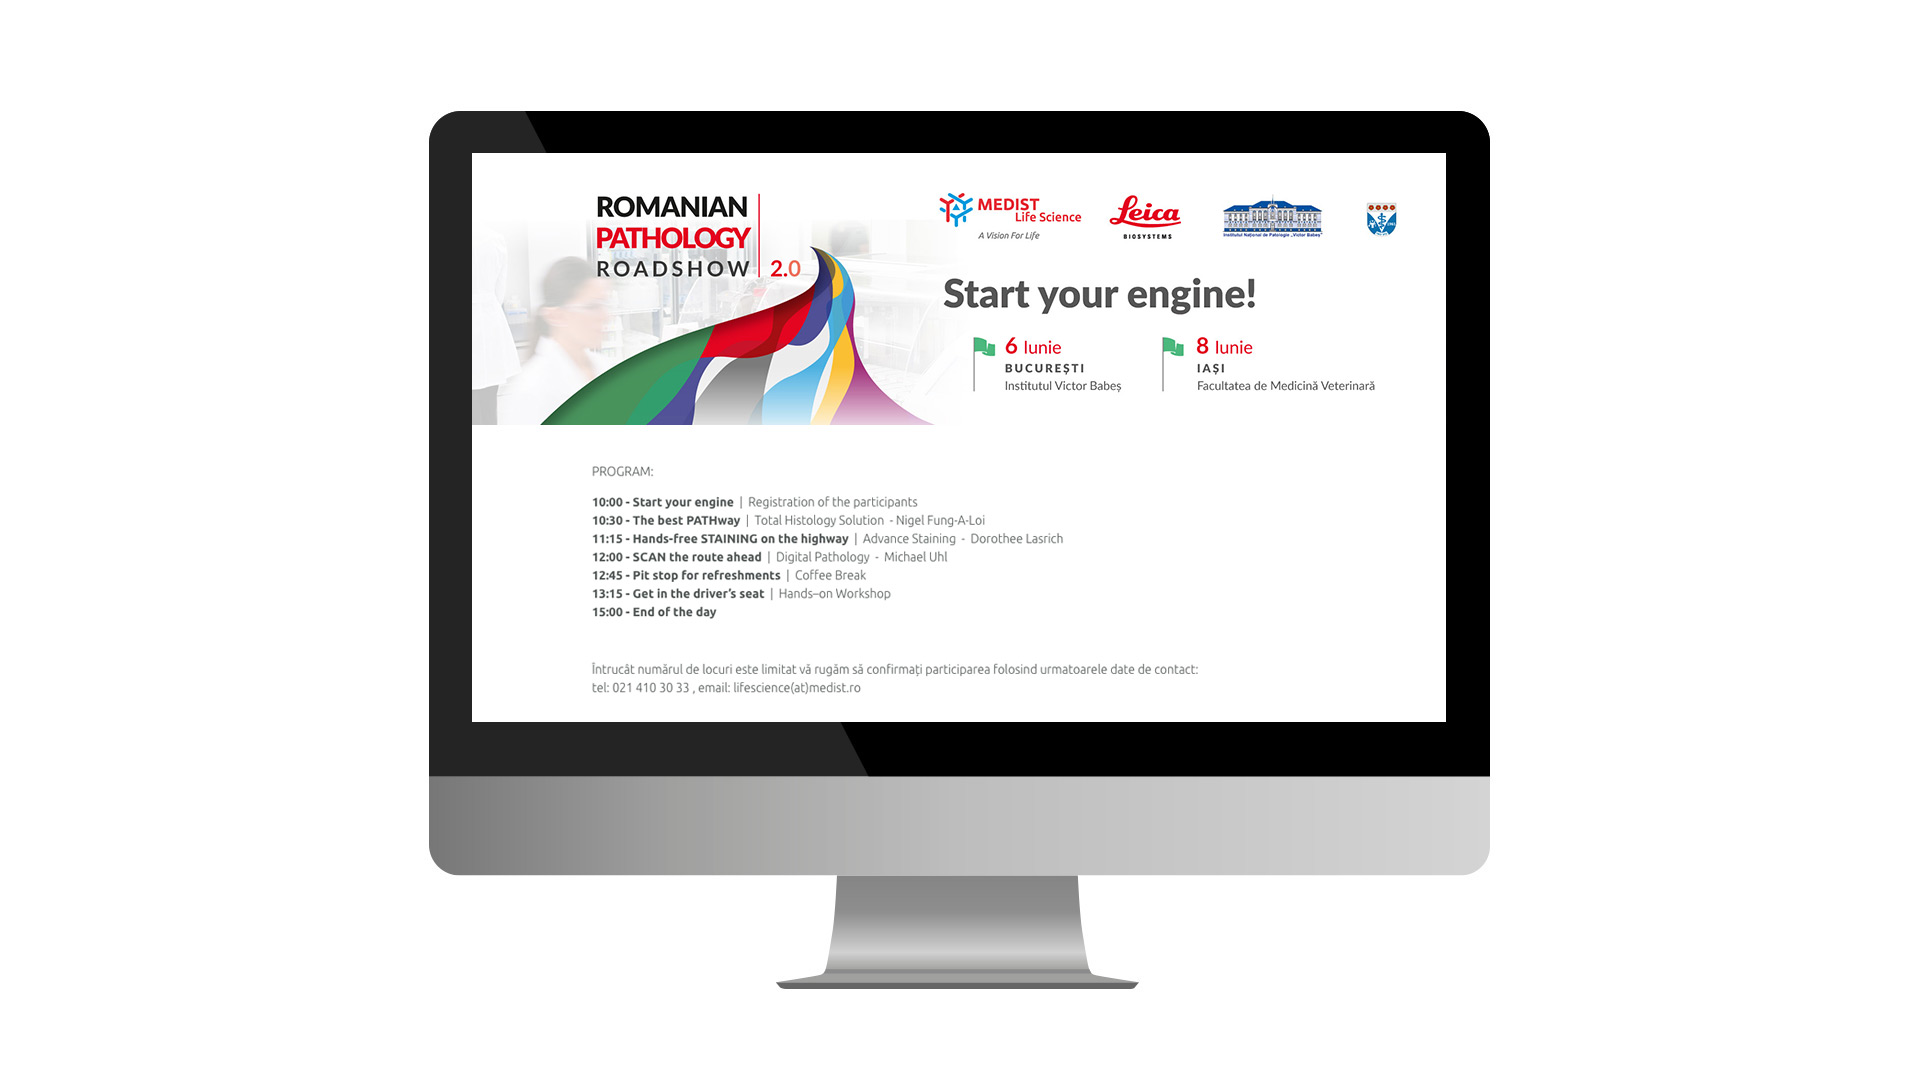 Romanian Pathology Roadshow web